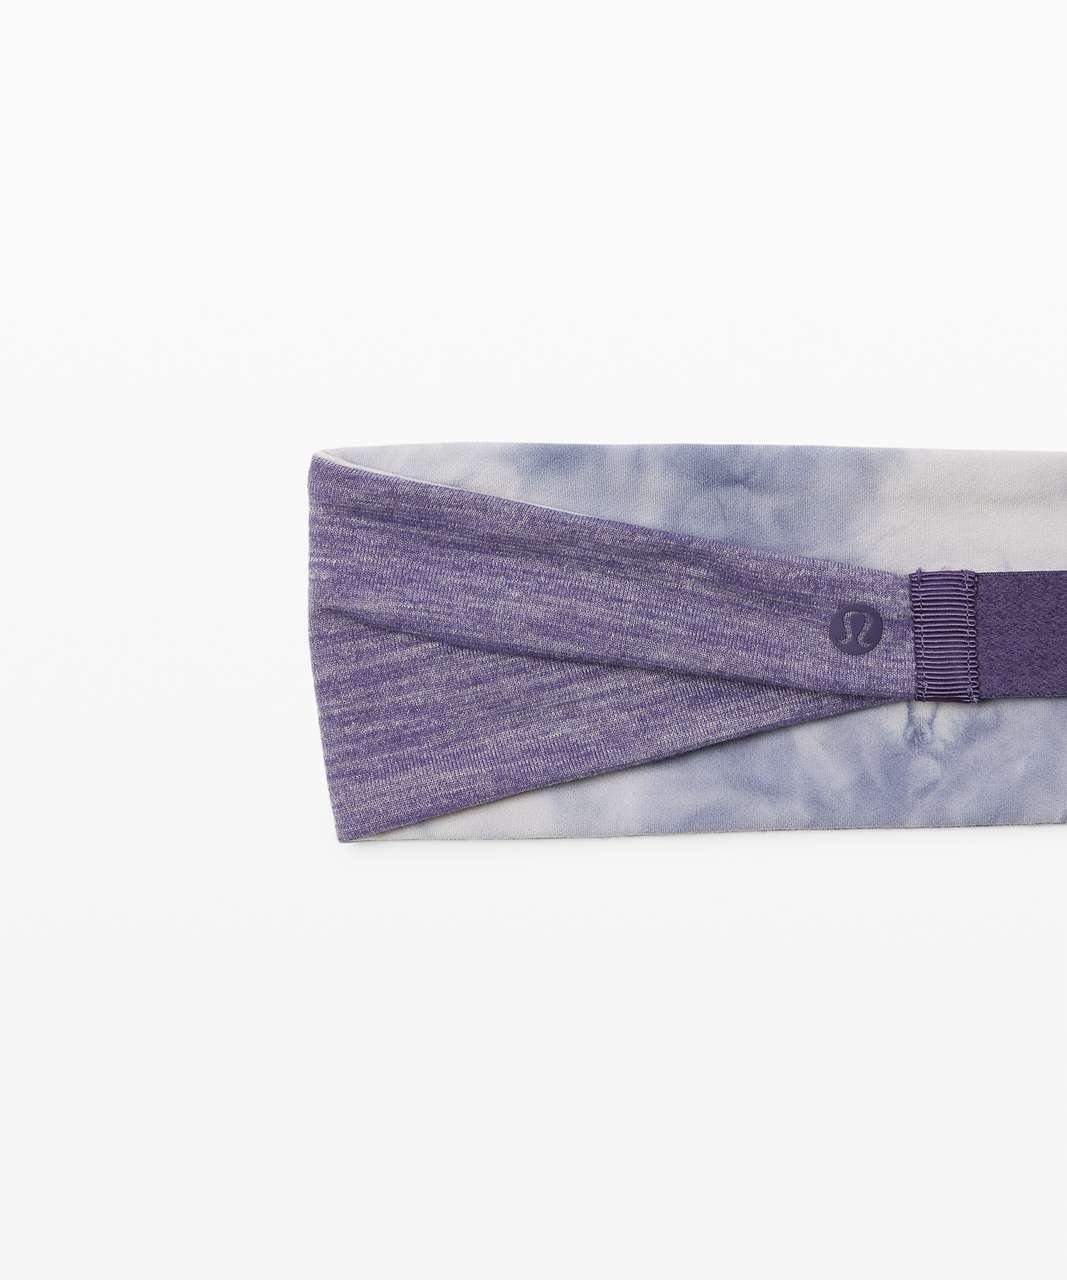 Lululemon Fringe Fighter Headband - Diamond Dye Iced Iris Peri Purple / Heathered Midnight Orchid